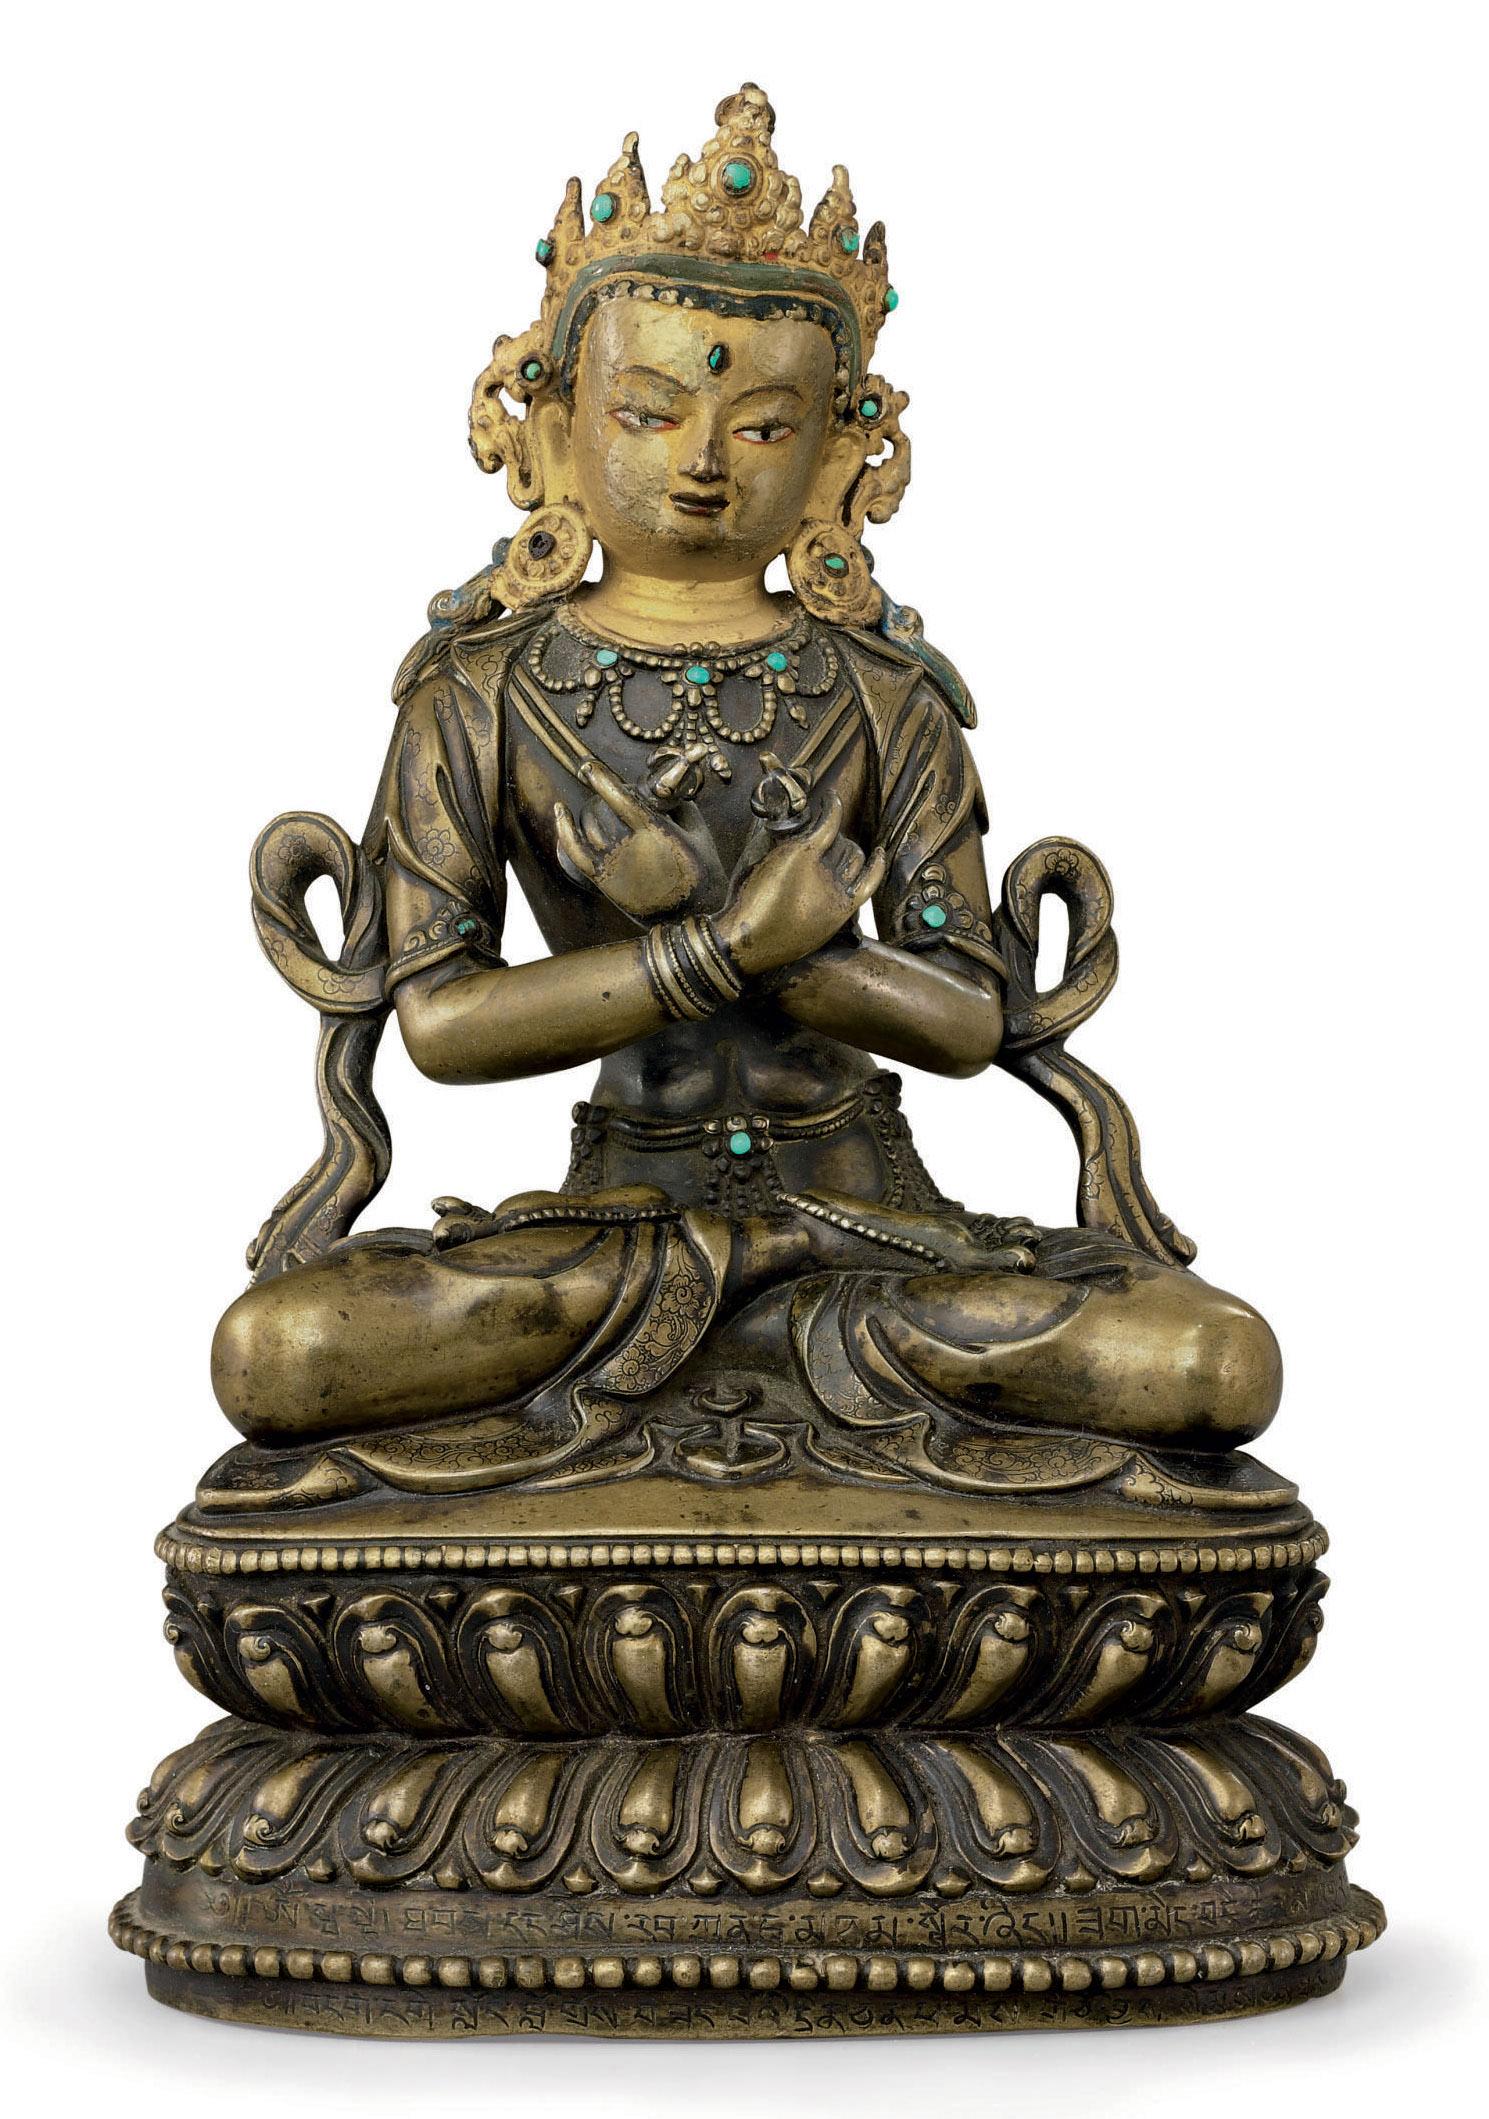 A bronze figure of Vajradhara